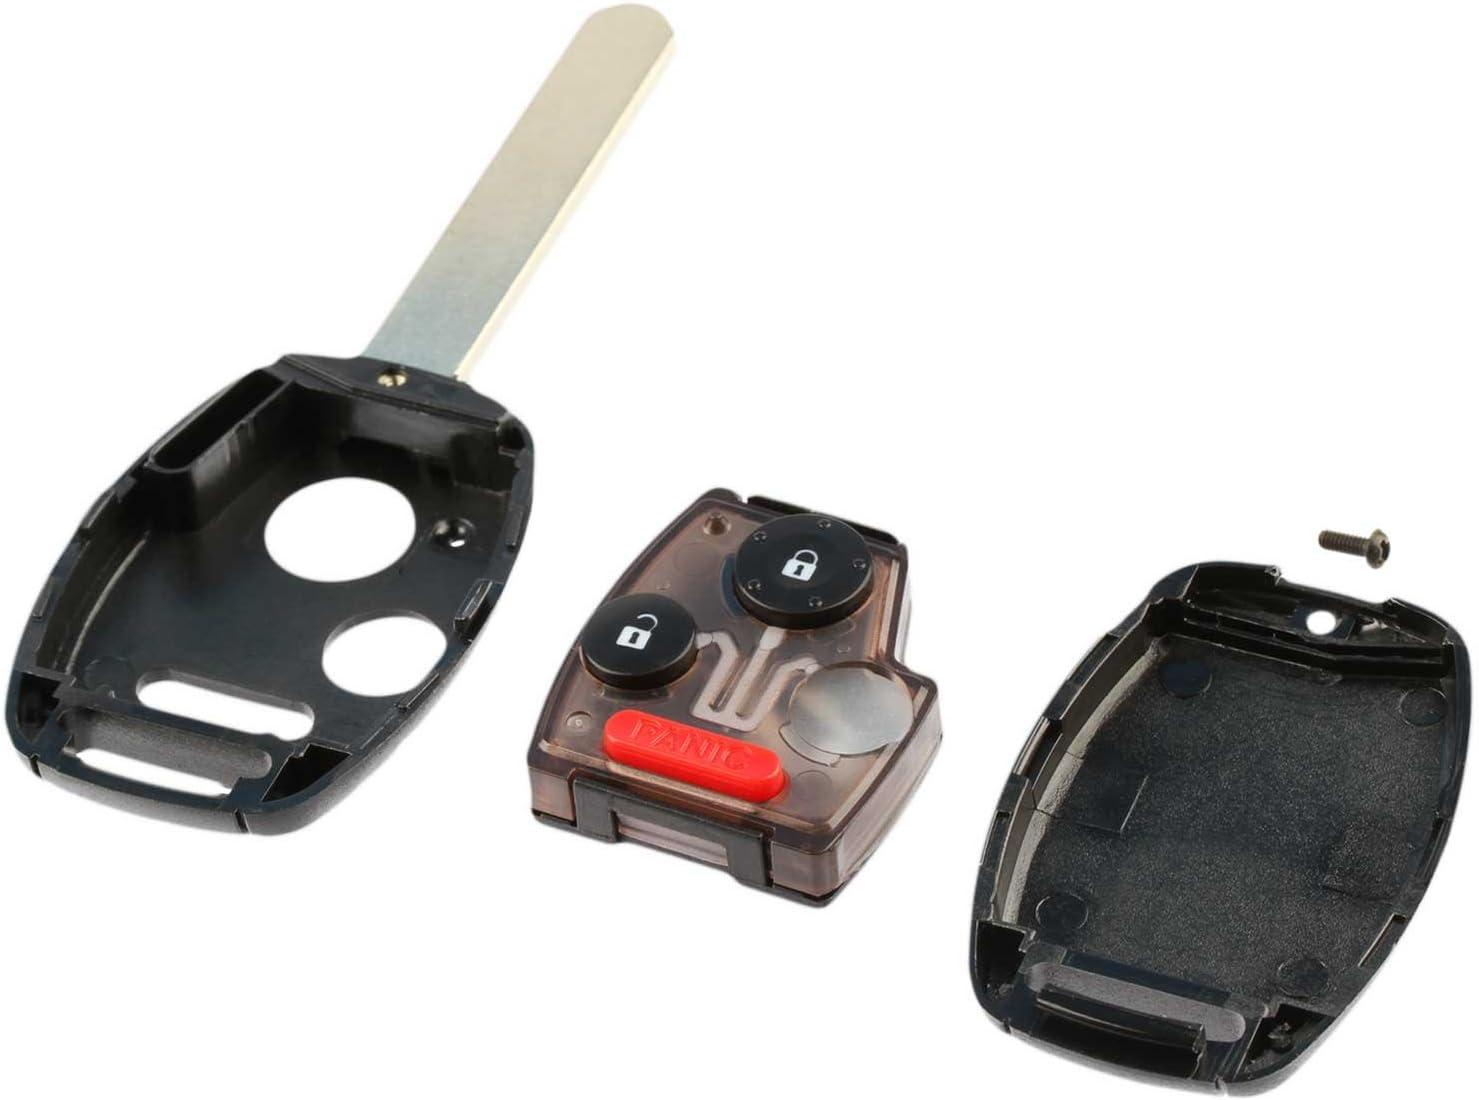 Key Fob Keyless Entry Remote Shell Case /& Pad fits Honda Accord /& CR-V 2003 2004 2005 2006 2007 OUCG8D-380H-A